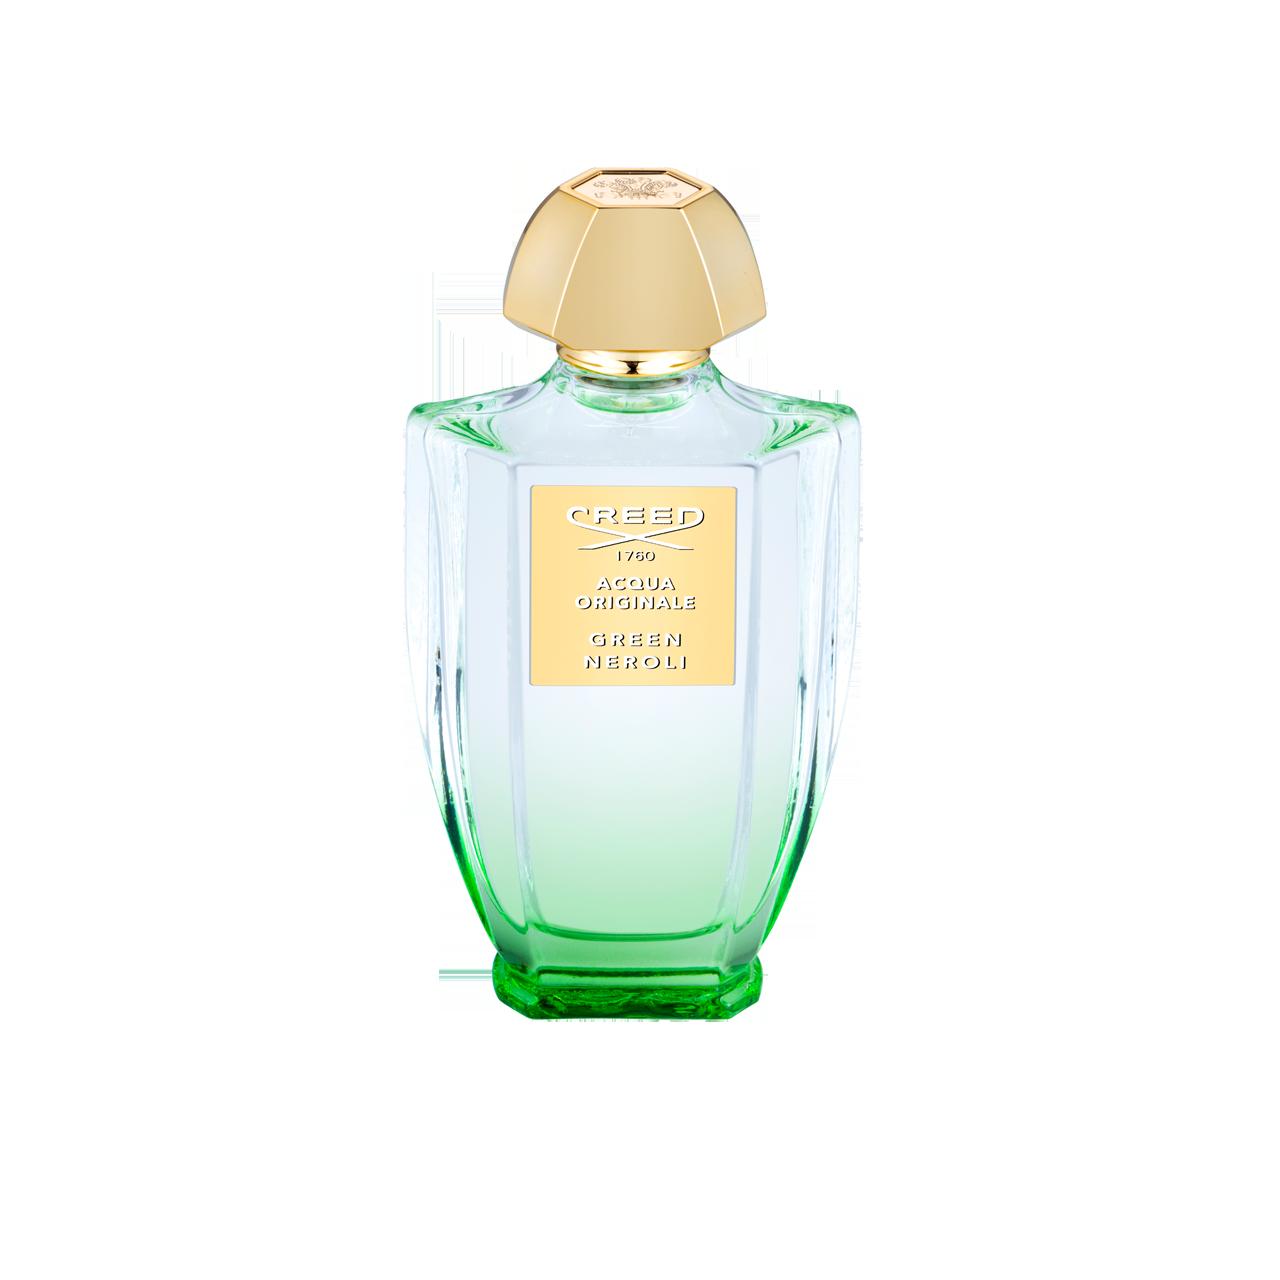 Green Neroli Acqua Originale - Eau de Parfum